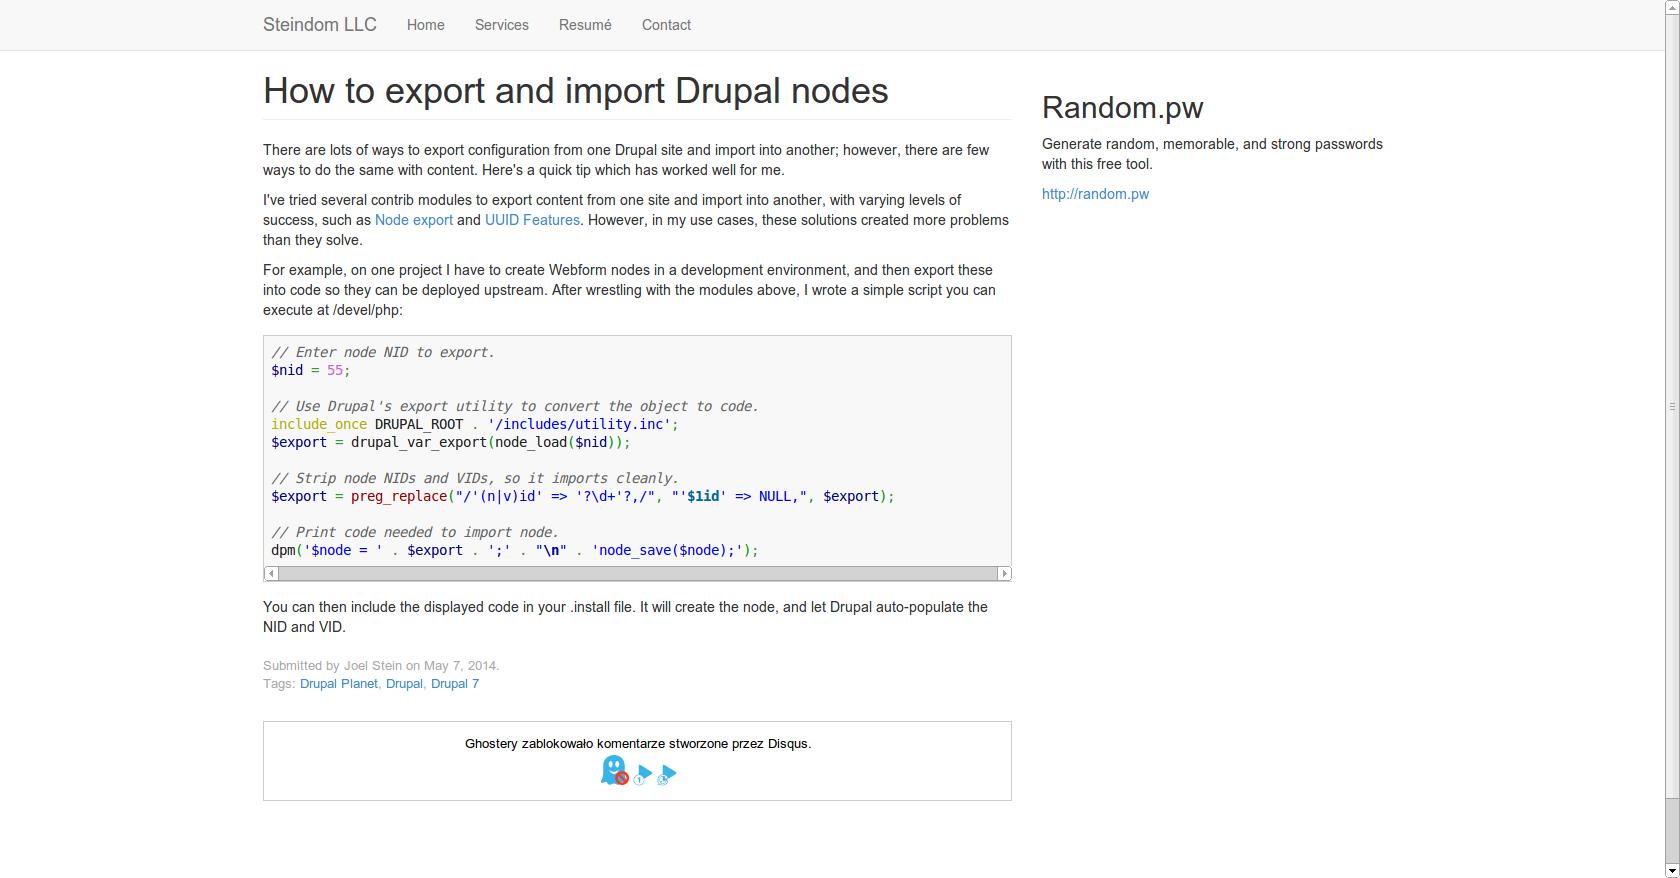 How to export and import Drupal nodes | Drupal | Pinterest